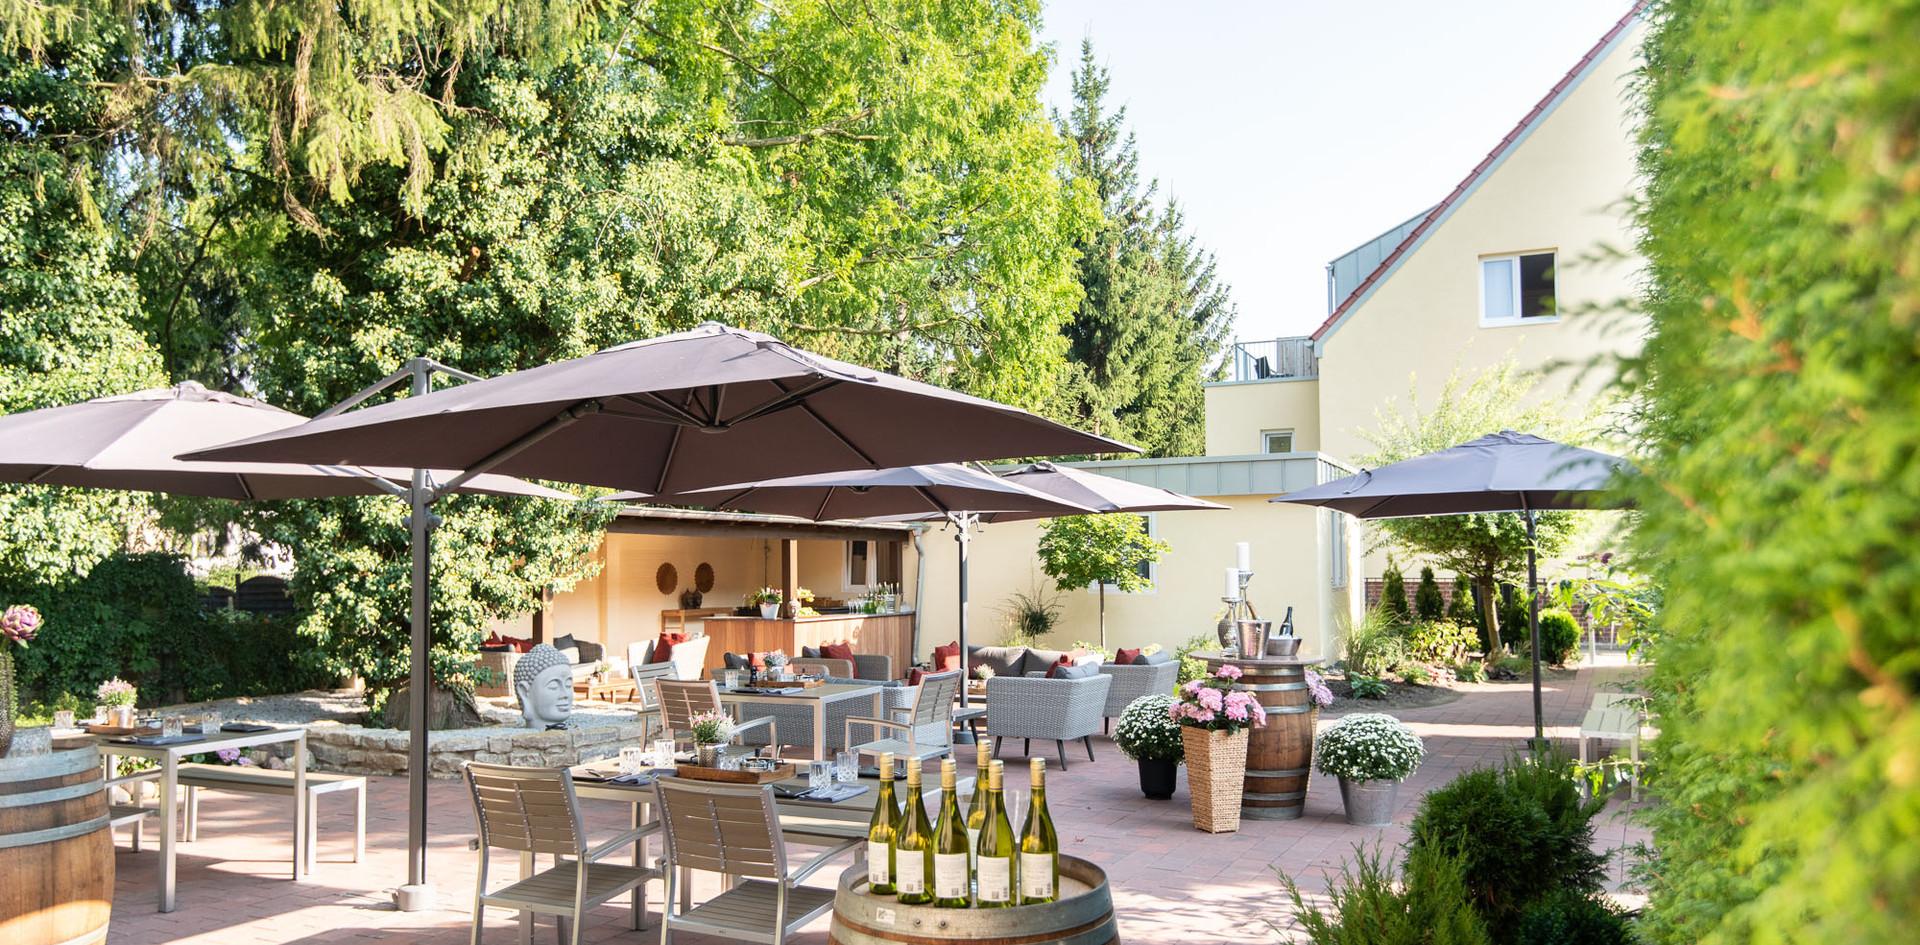 Terasse im Sommer Hotel Wegner - the culinary art hotel